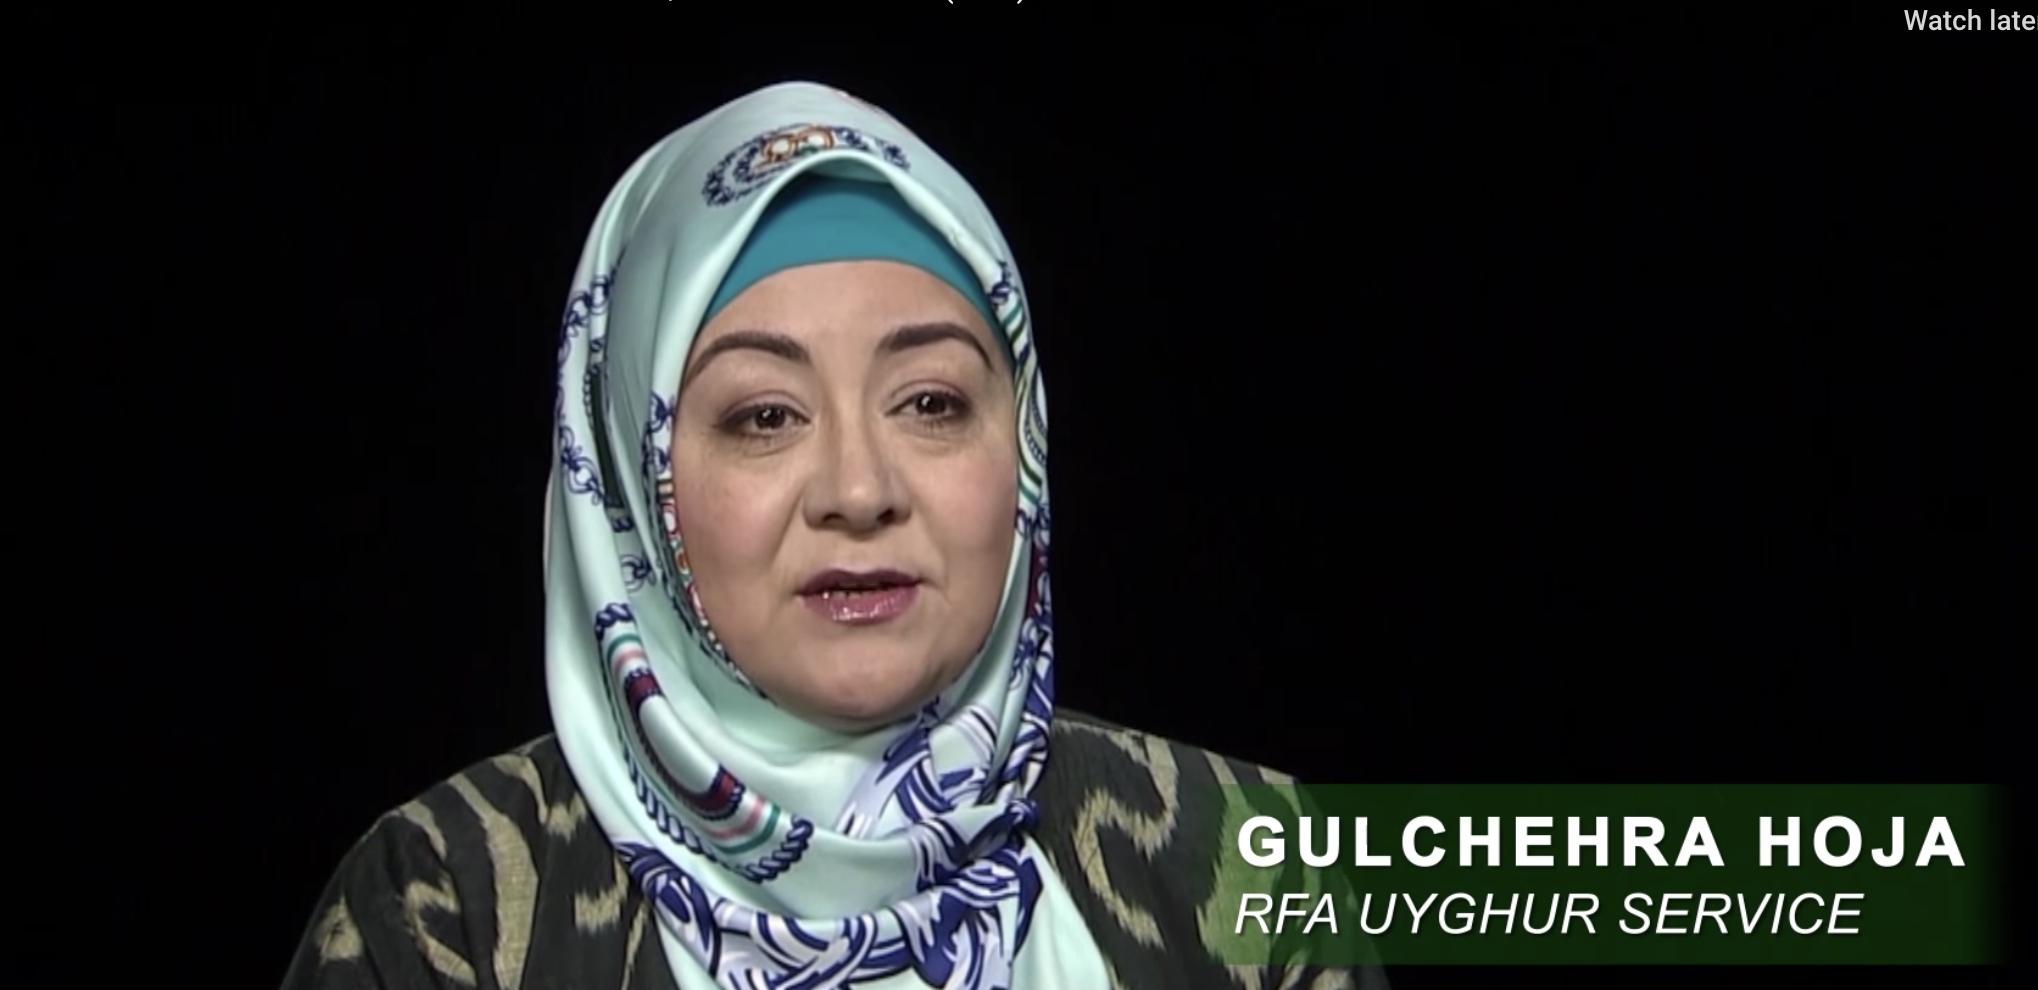 Radio Free Asia Uyghur journalist wins Magnitsky Human Rights Award